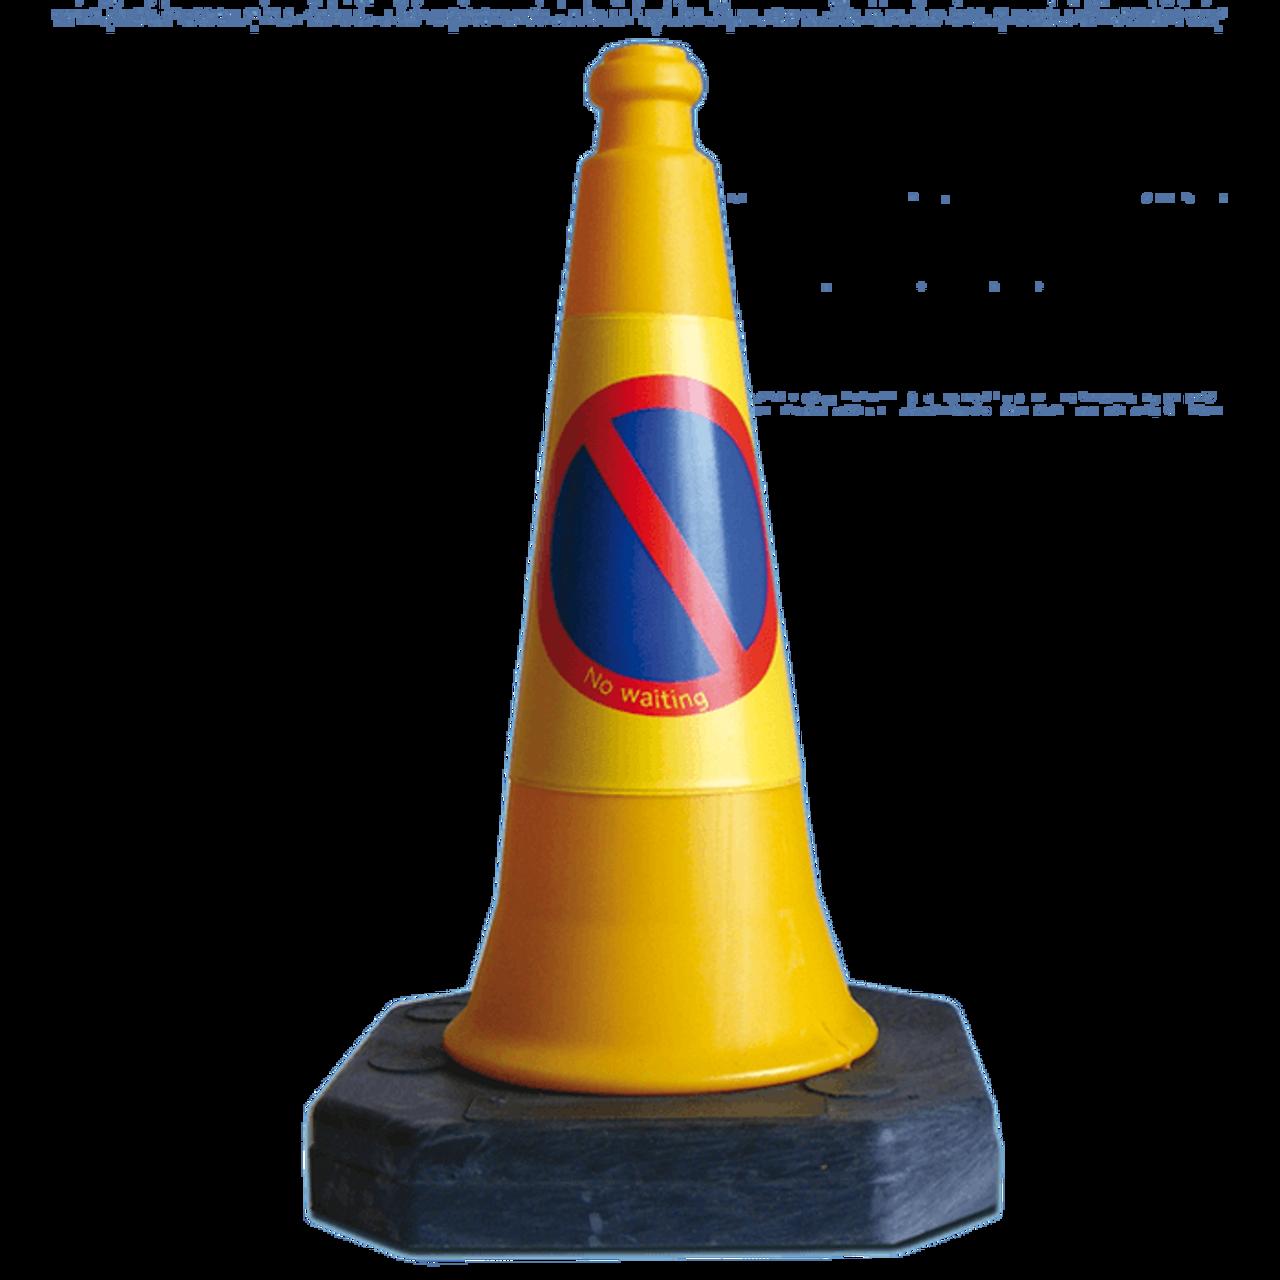 Mastercone 50cm No Waiting traffic cones